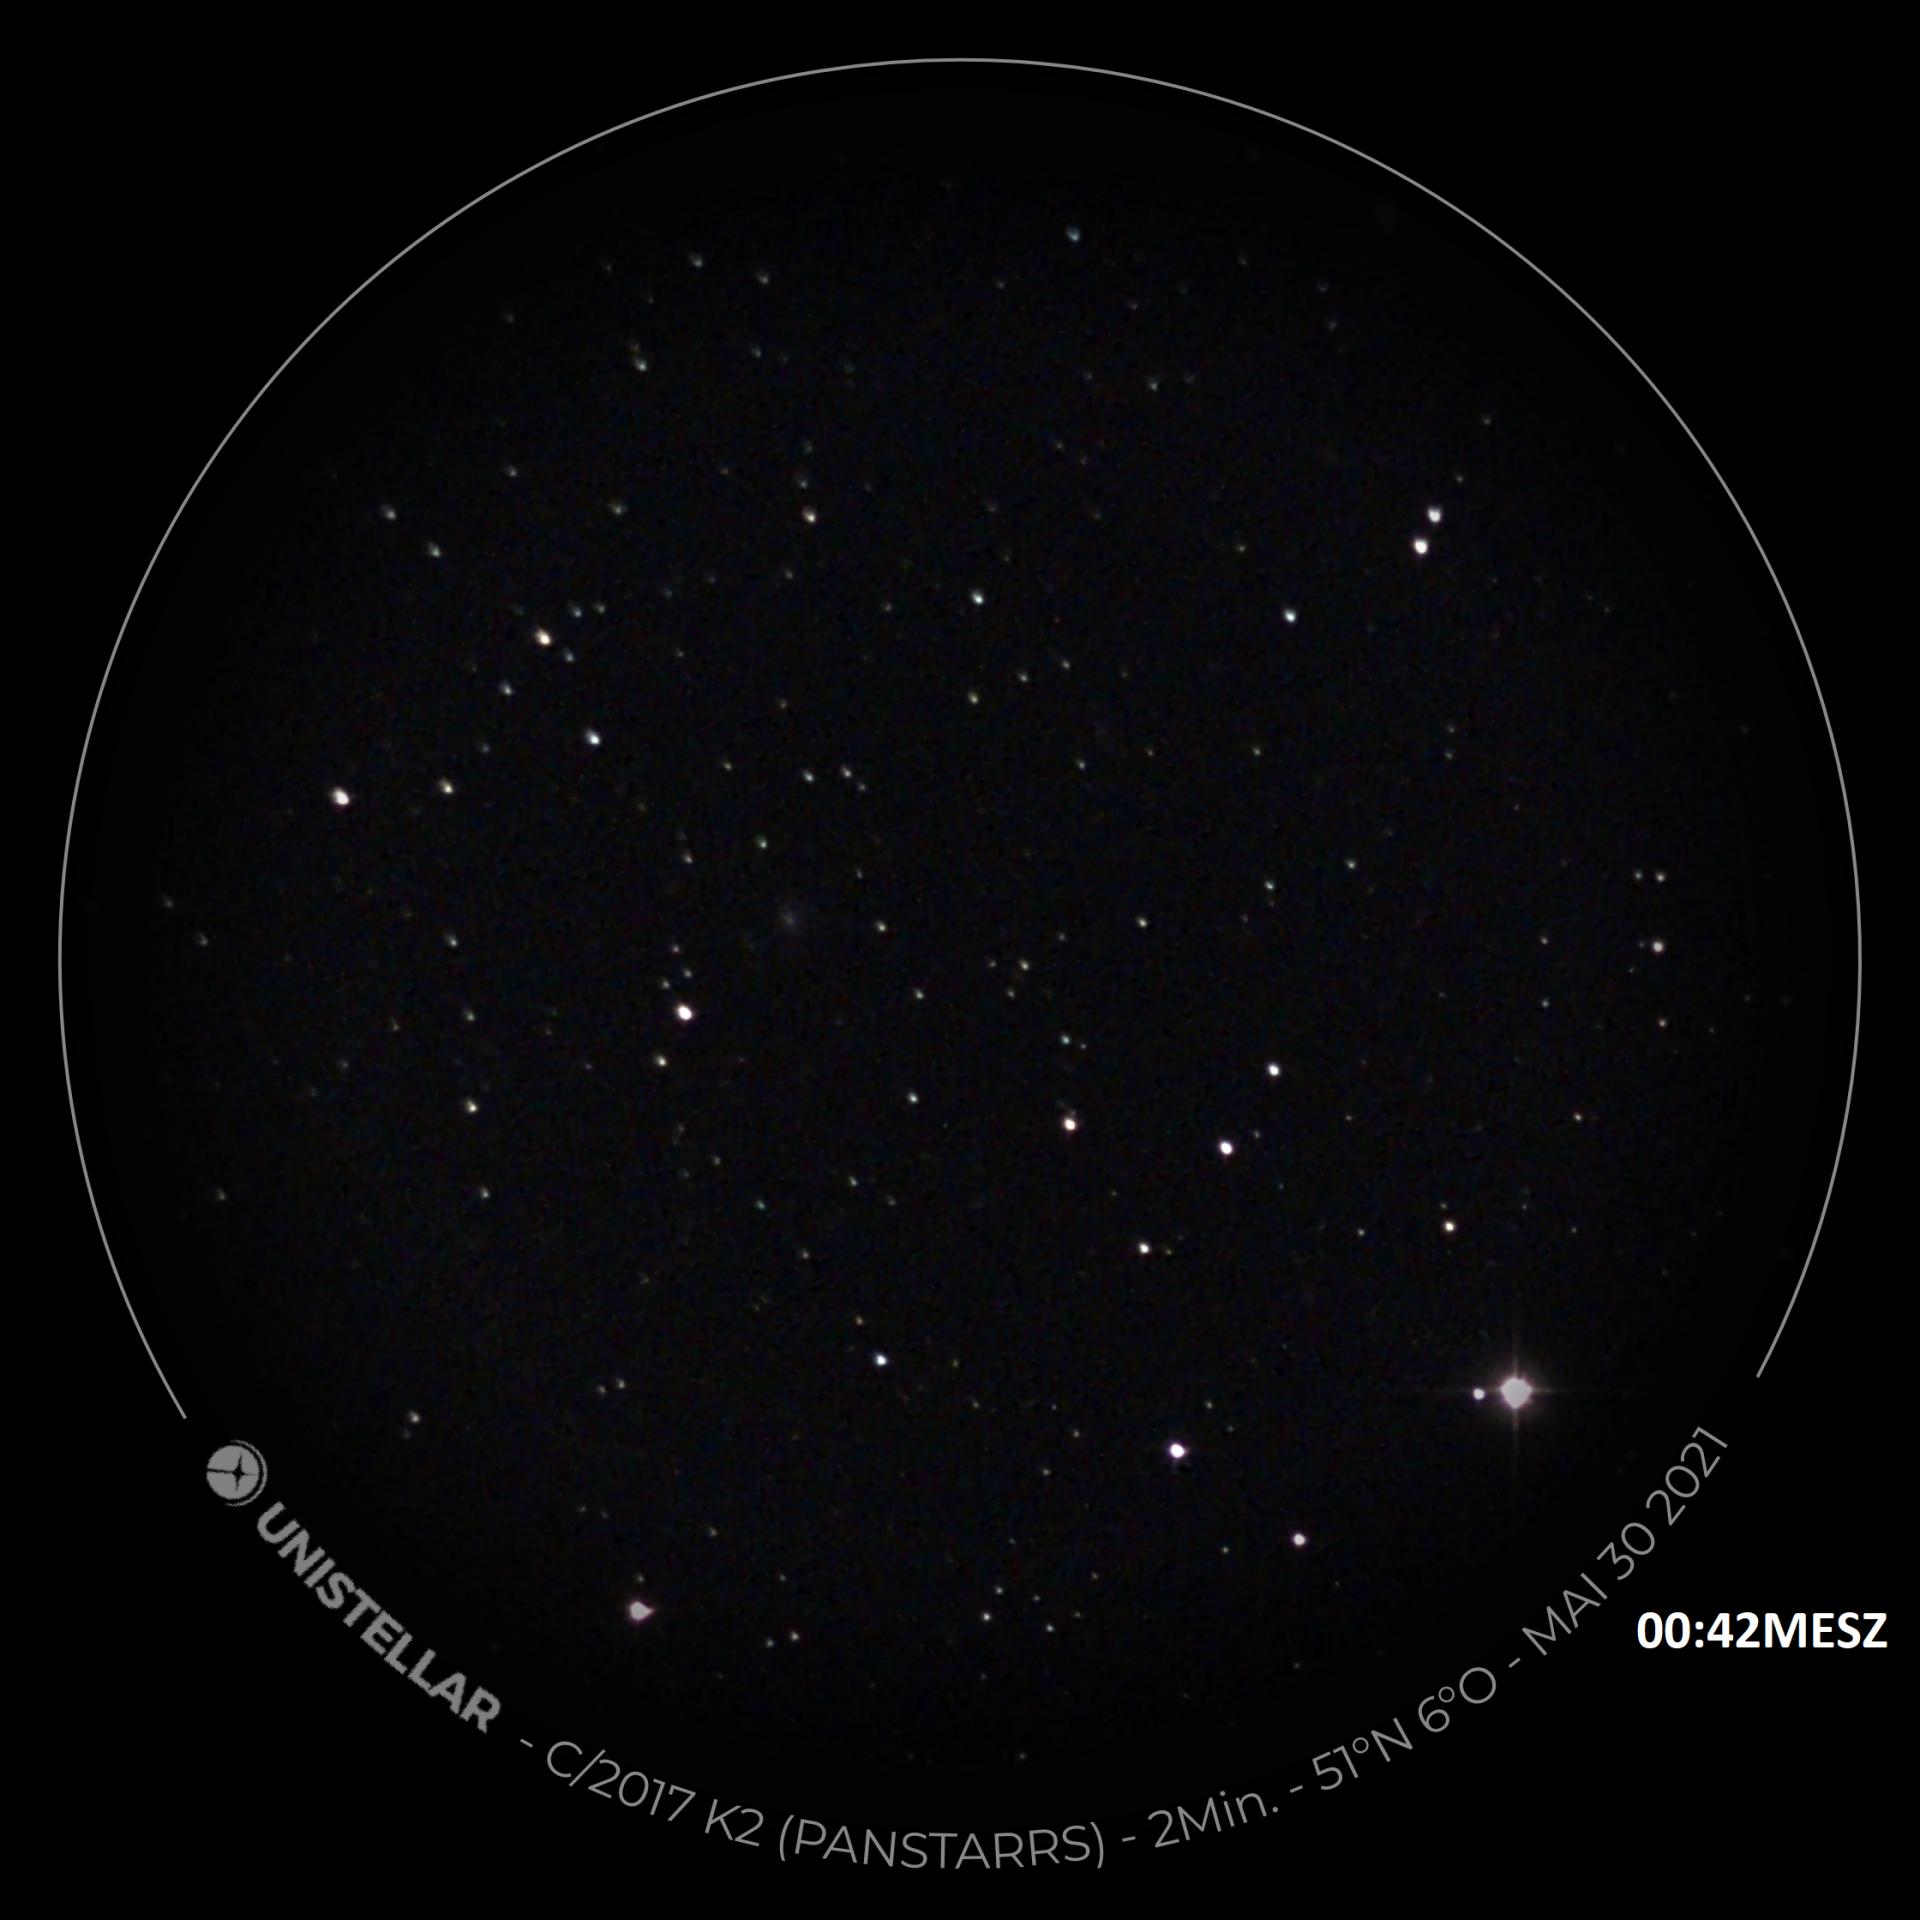 C2017 K2 Panstarrs eVscope-20210529-224242.png